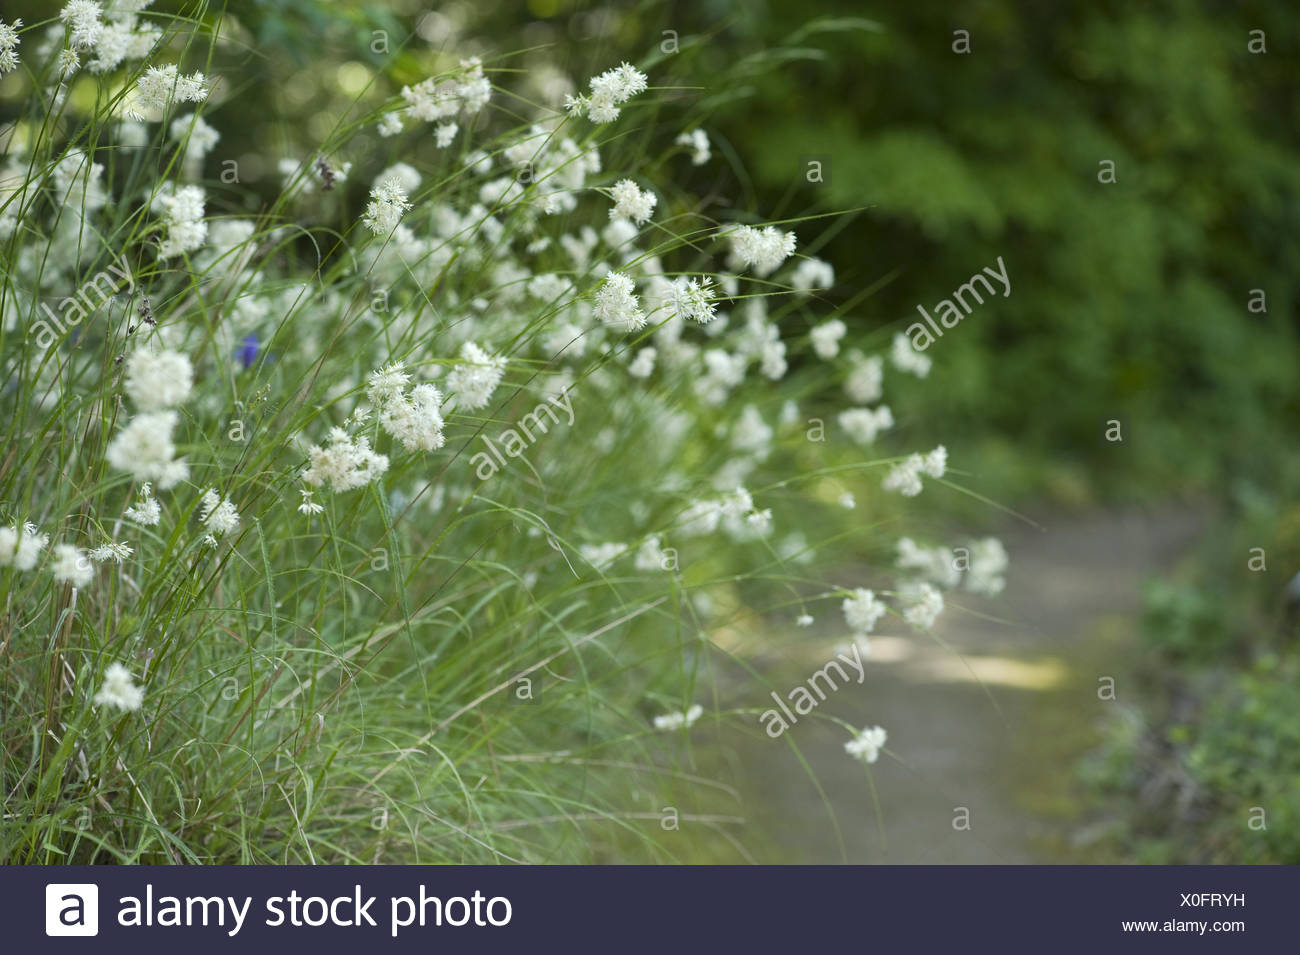 lesser wood-rush, luzula nivea - Stock Image